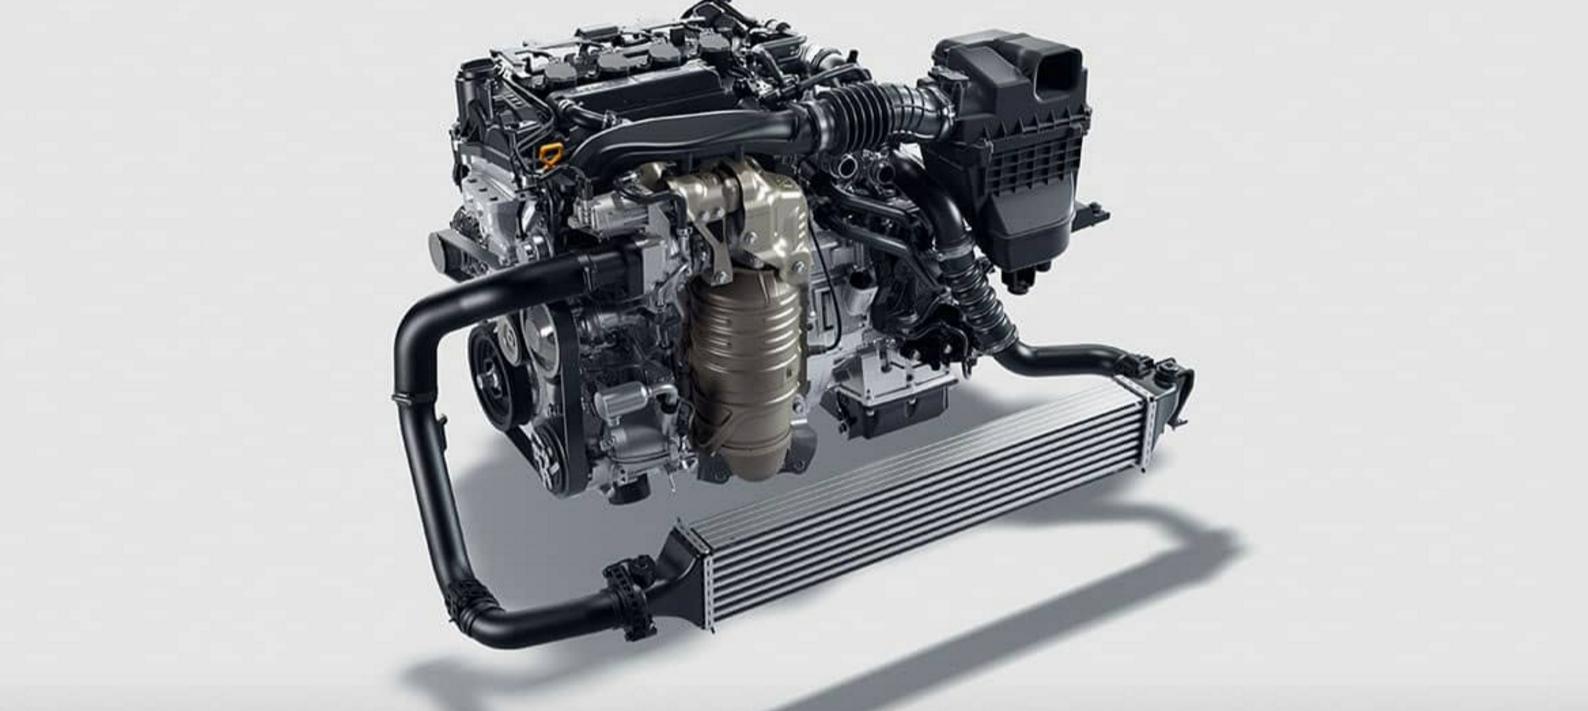 Civic-1.5L-Turbo-Engine.png